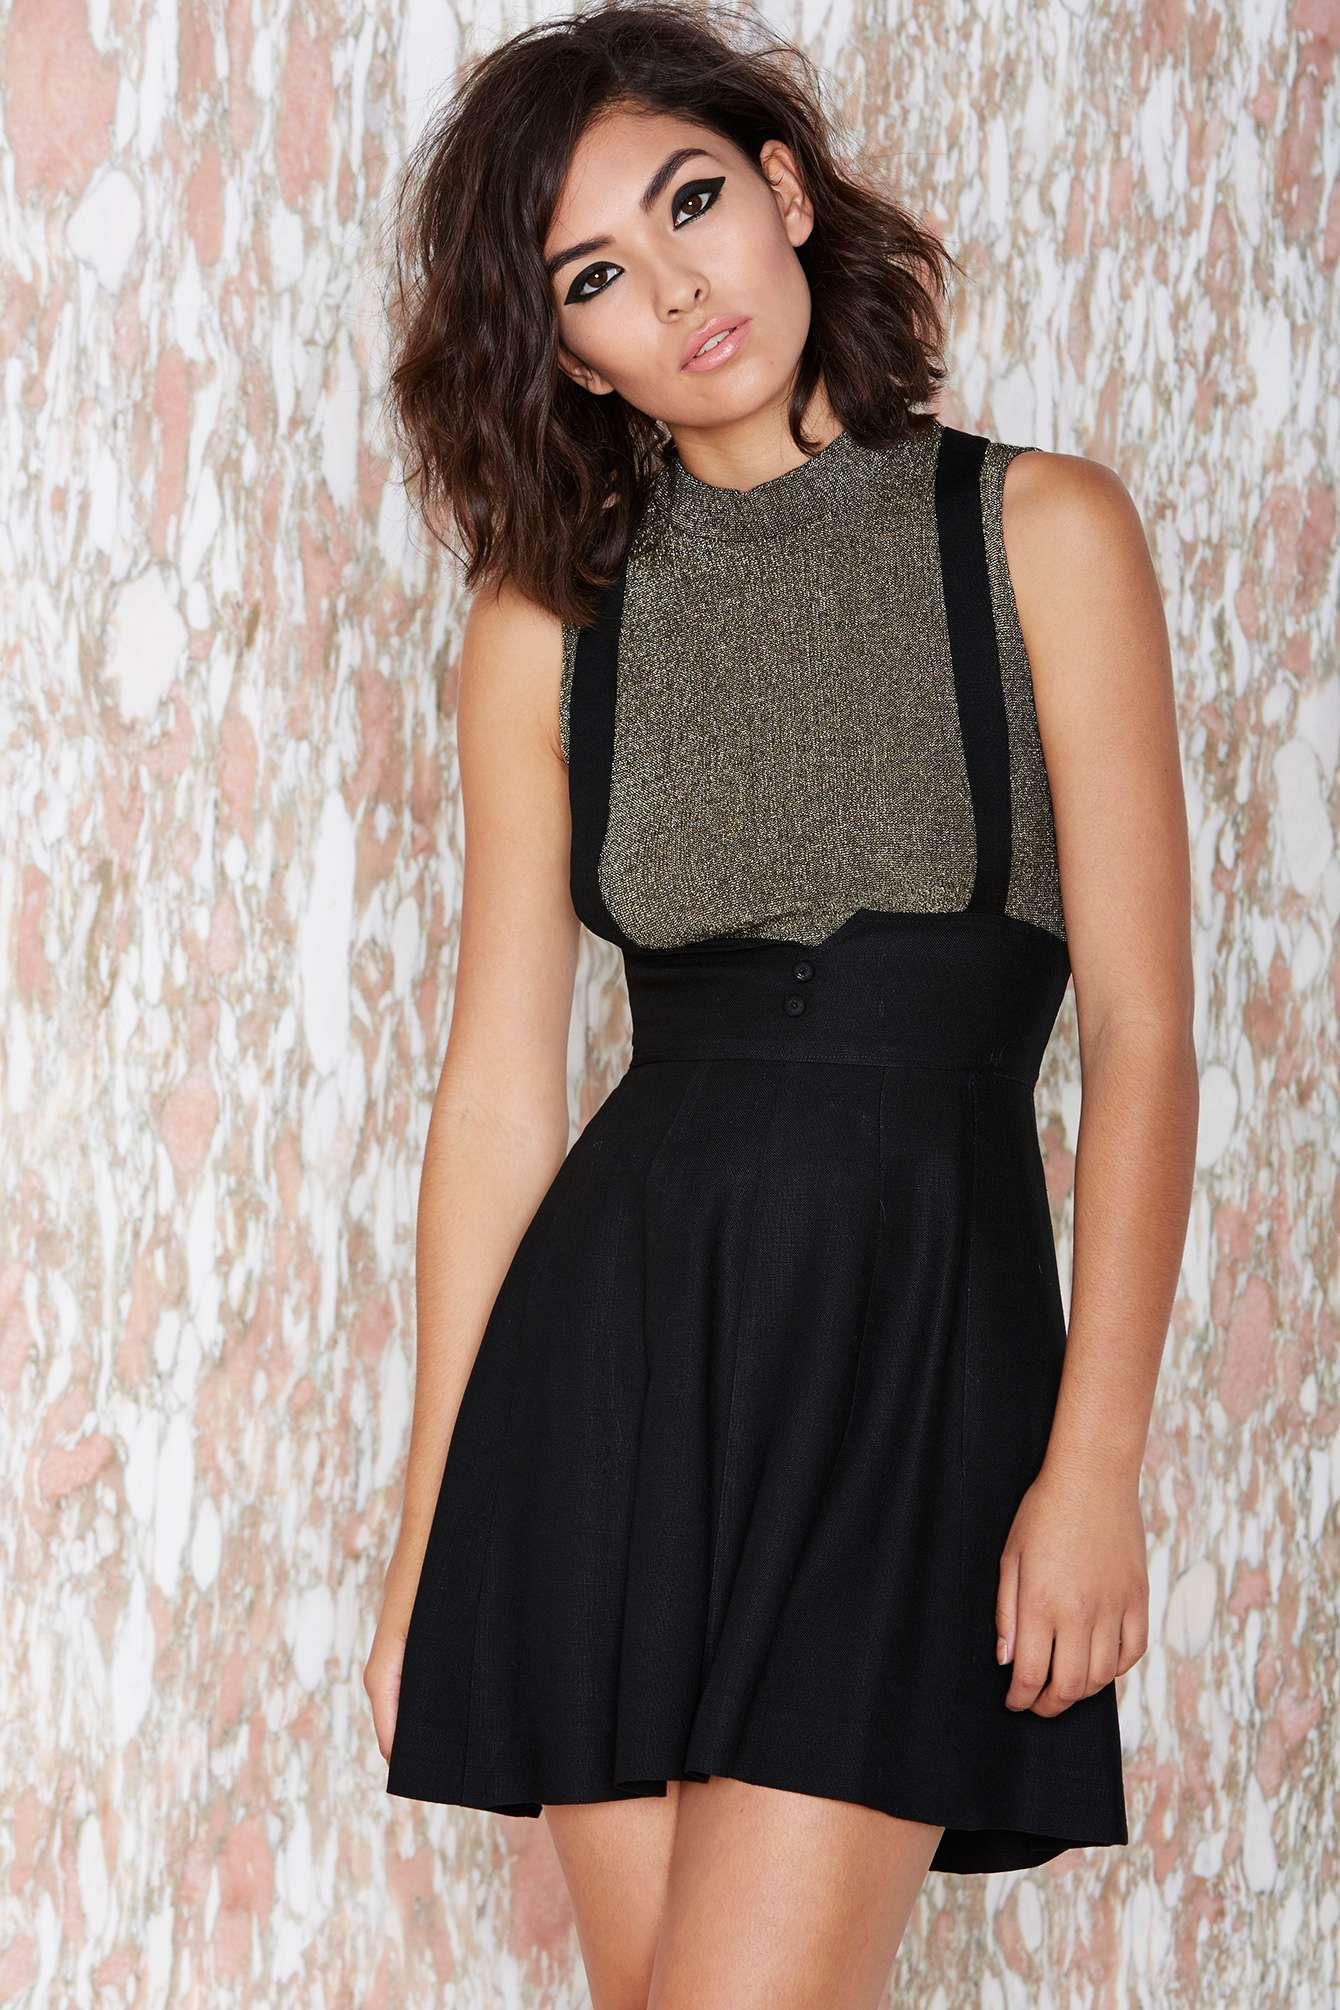 Vintage Suspend Your Disbelief Skirt | #Vintage | Pinterest